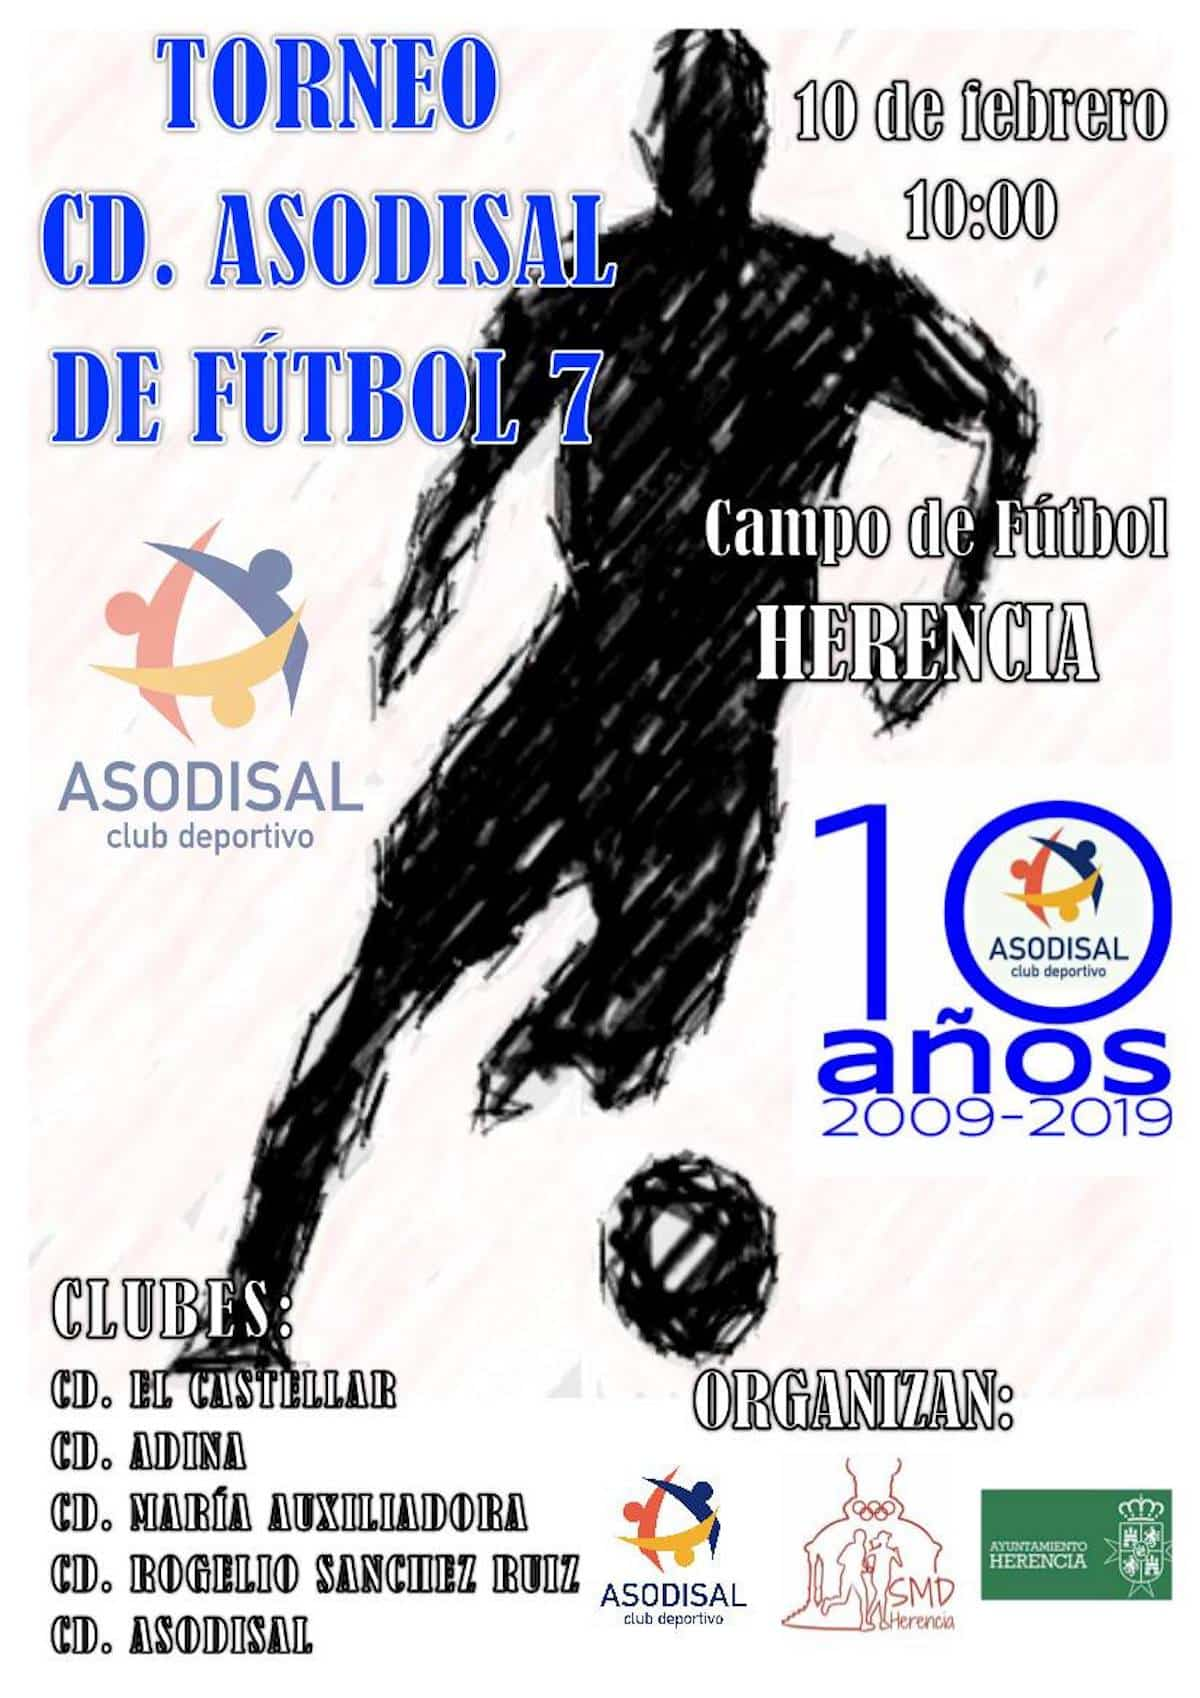 Torneo de fútbol 7 en Herencia organizado por CD. Asodisal 3